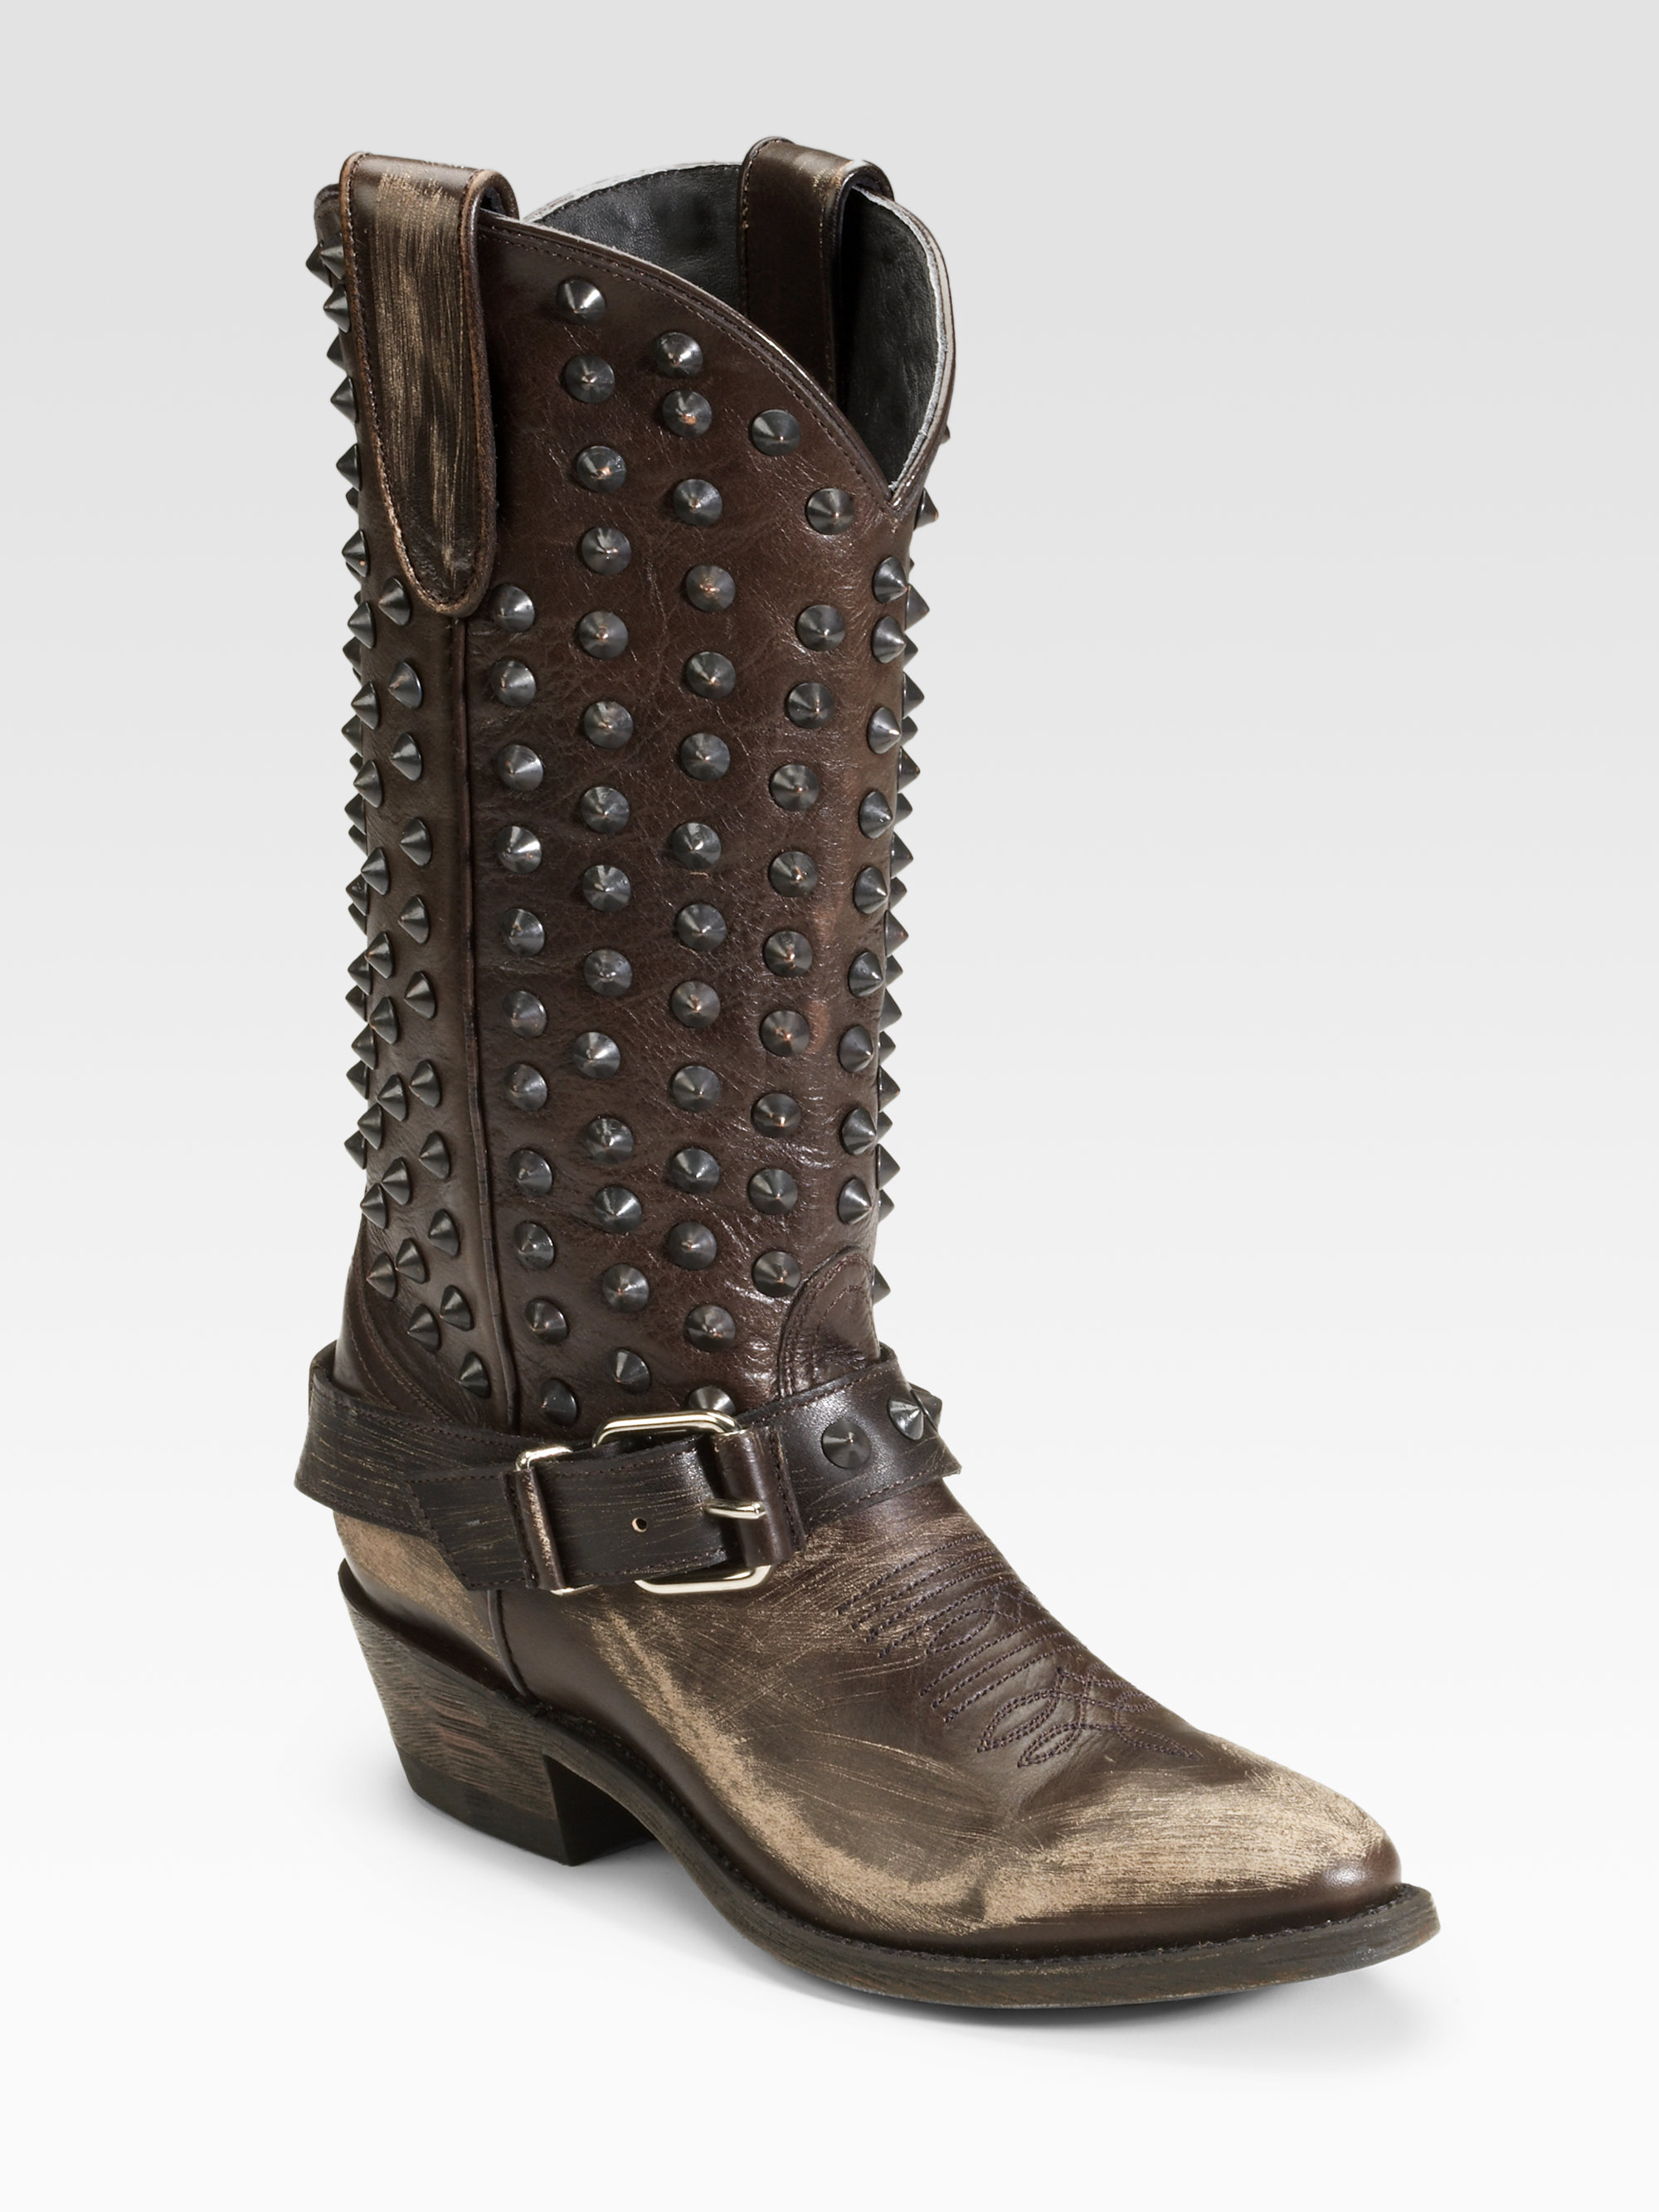 7ea71a16c6b Ash Brown Studded Cowboy Boots